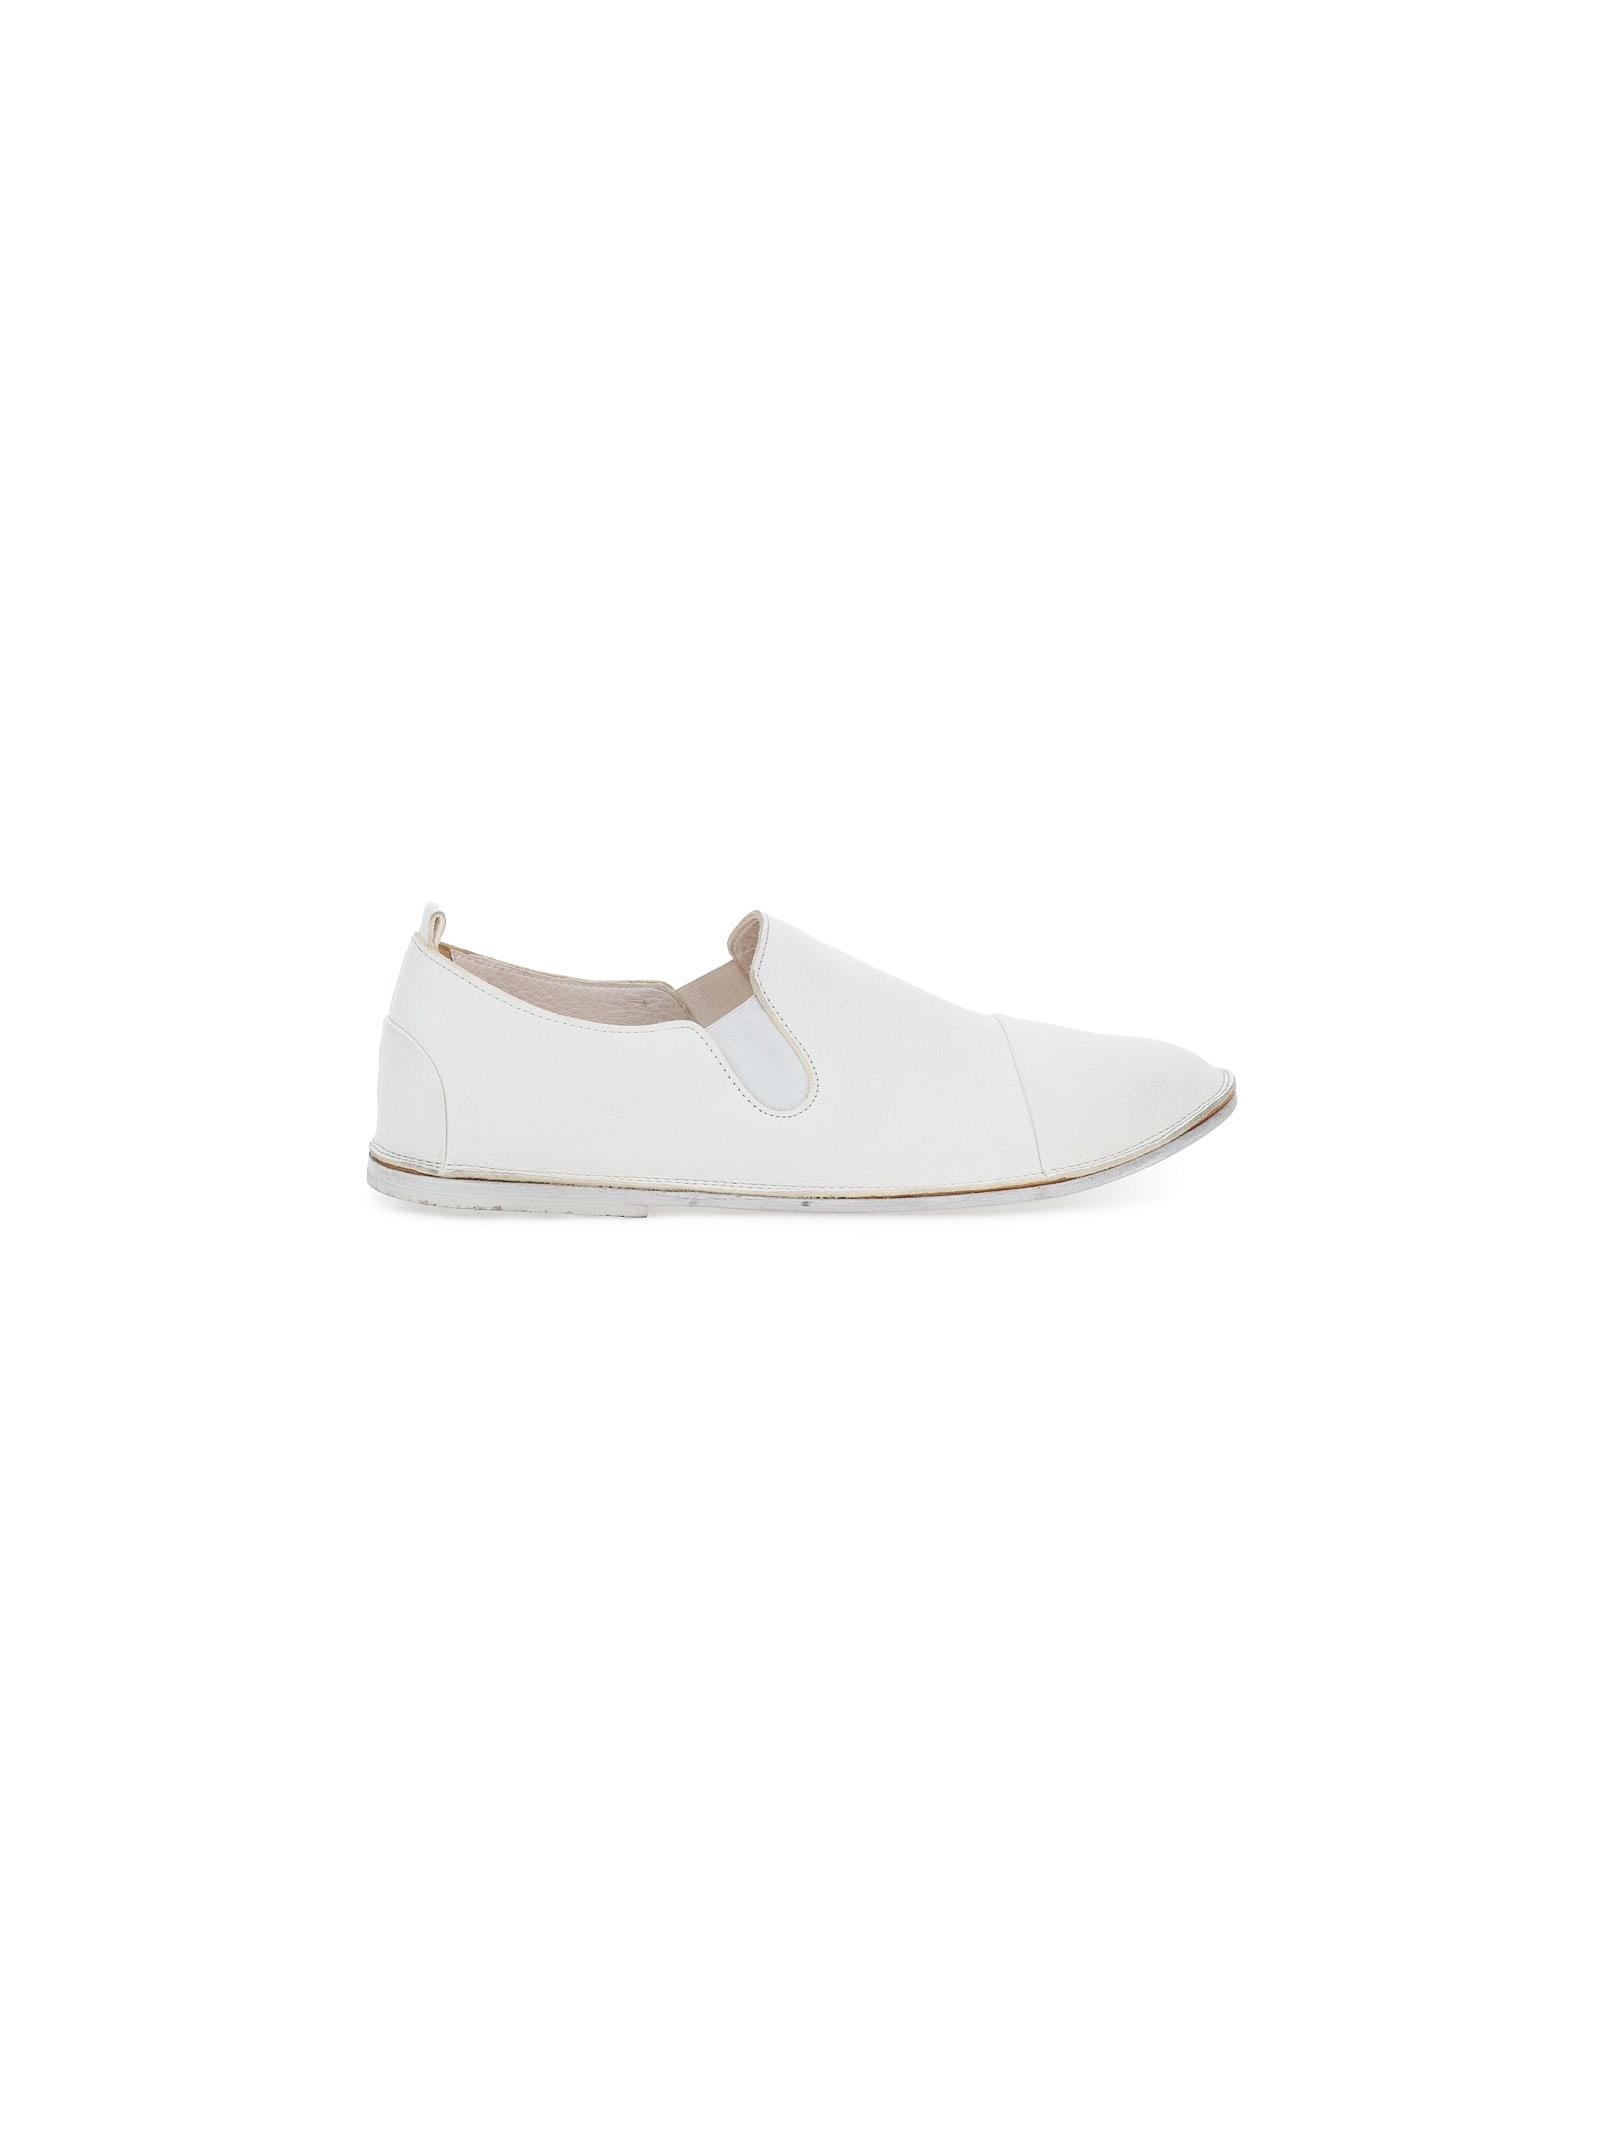 Marsell Slip-on Loafer